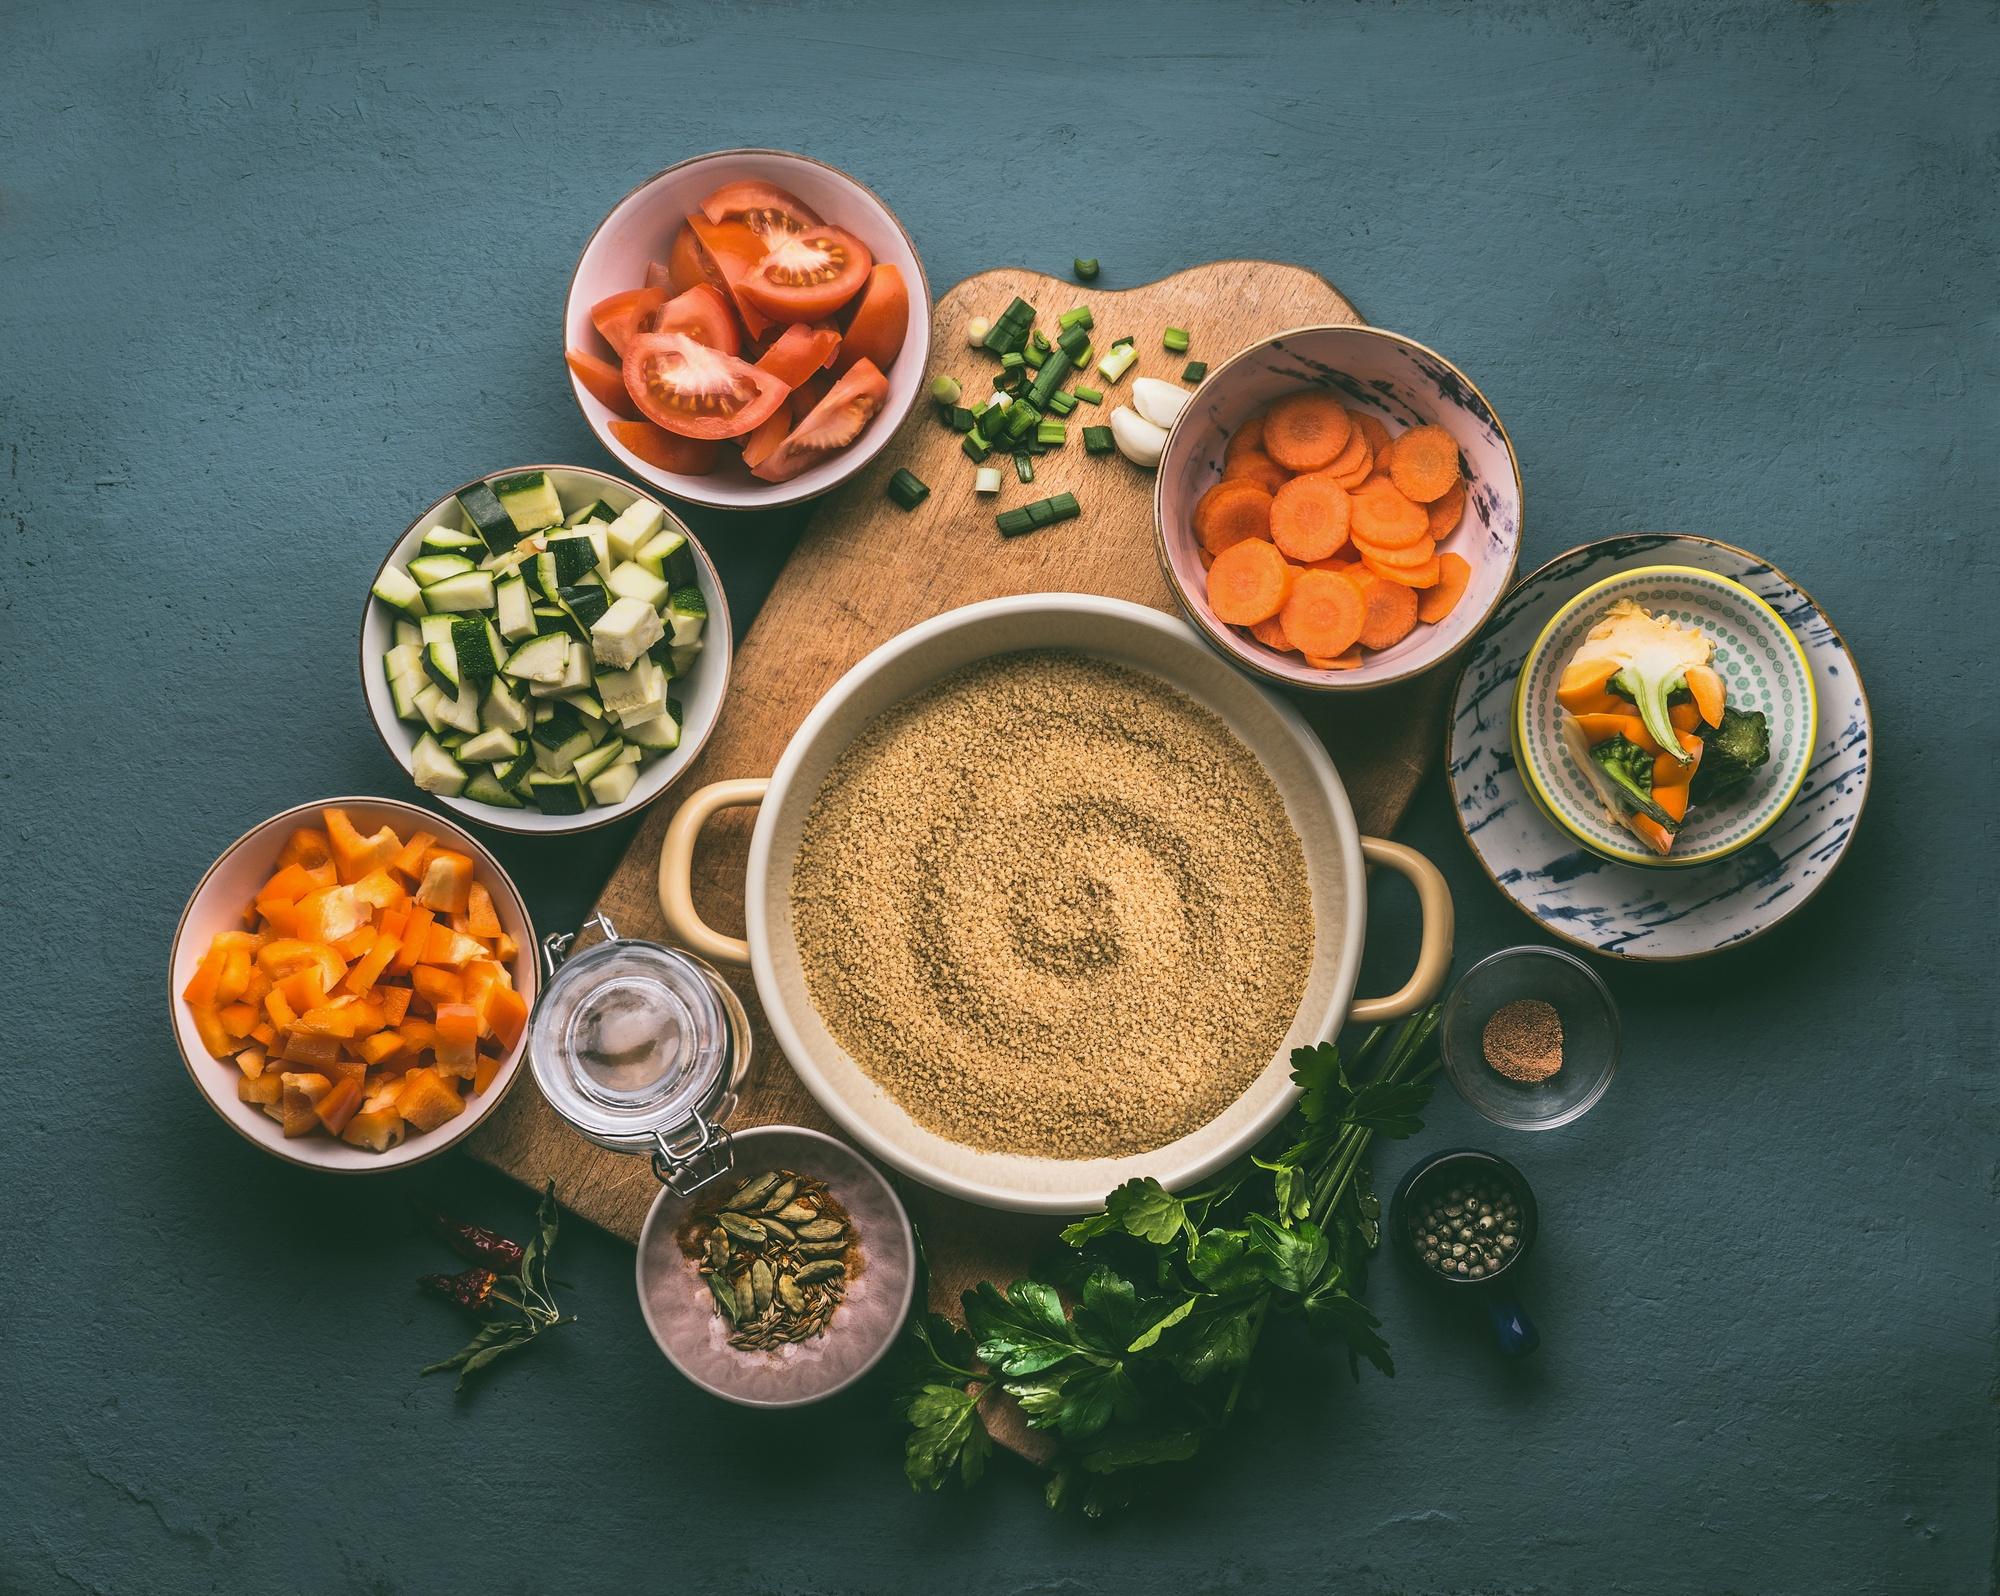 Moroccan menu